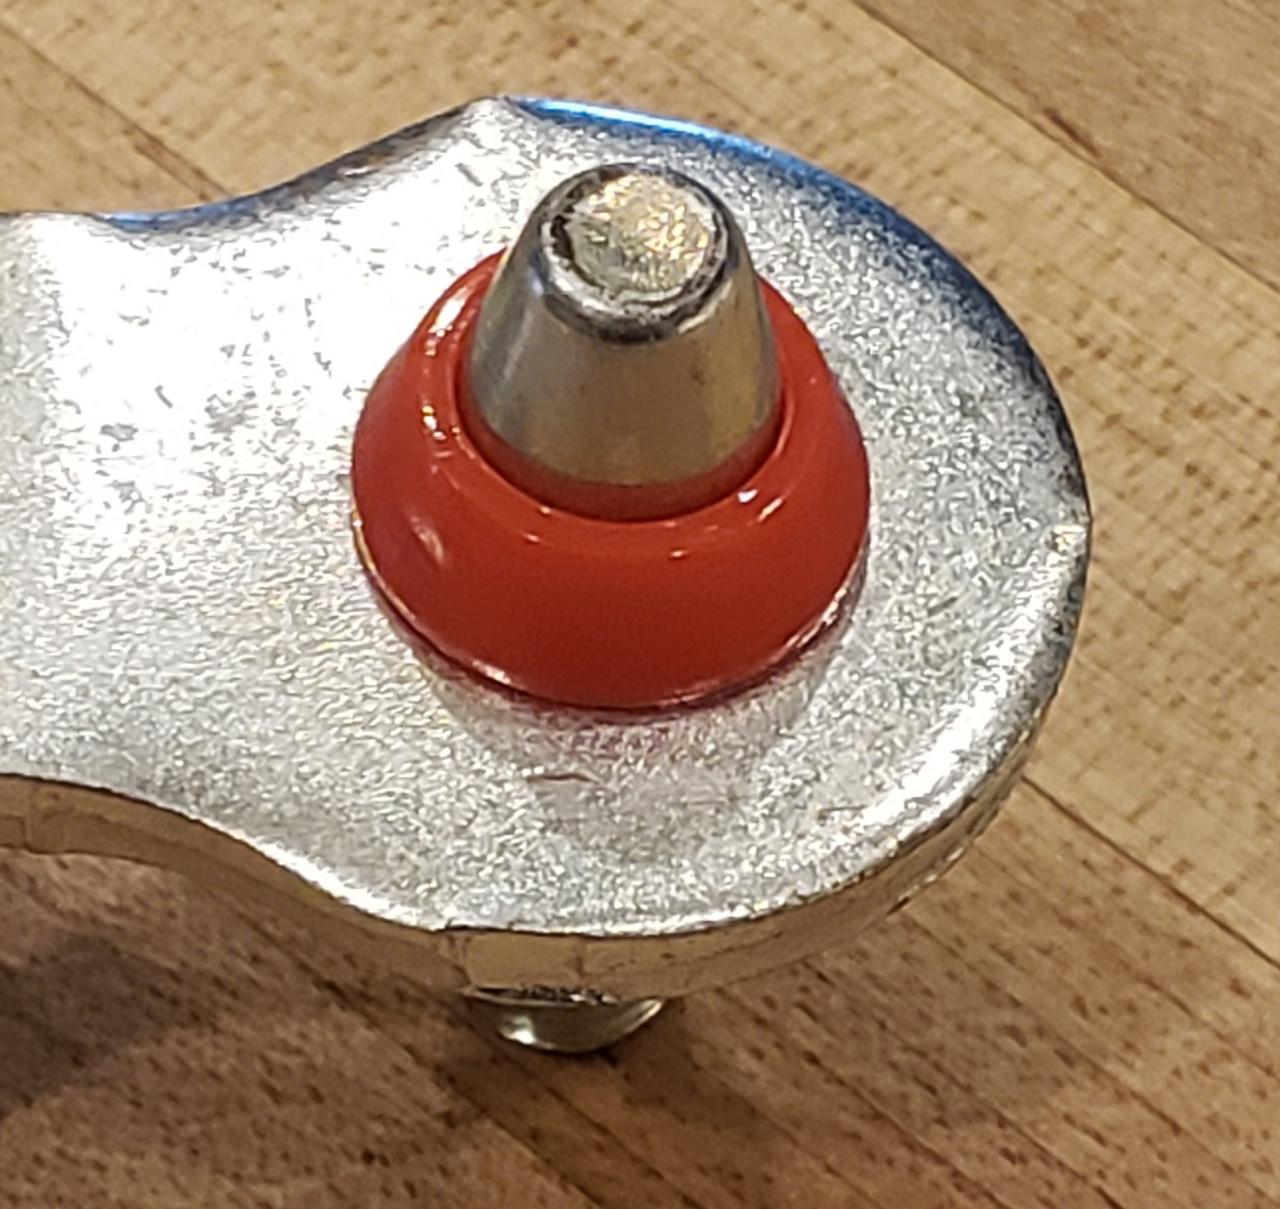 Mercury Marauder FA1KIT™ Transmission Shift Lever / Linkage Replacement Bushing Kit fits onto pin as shown.